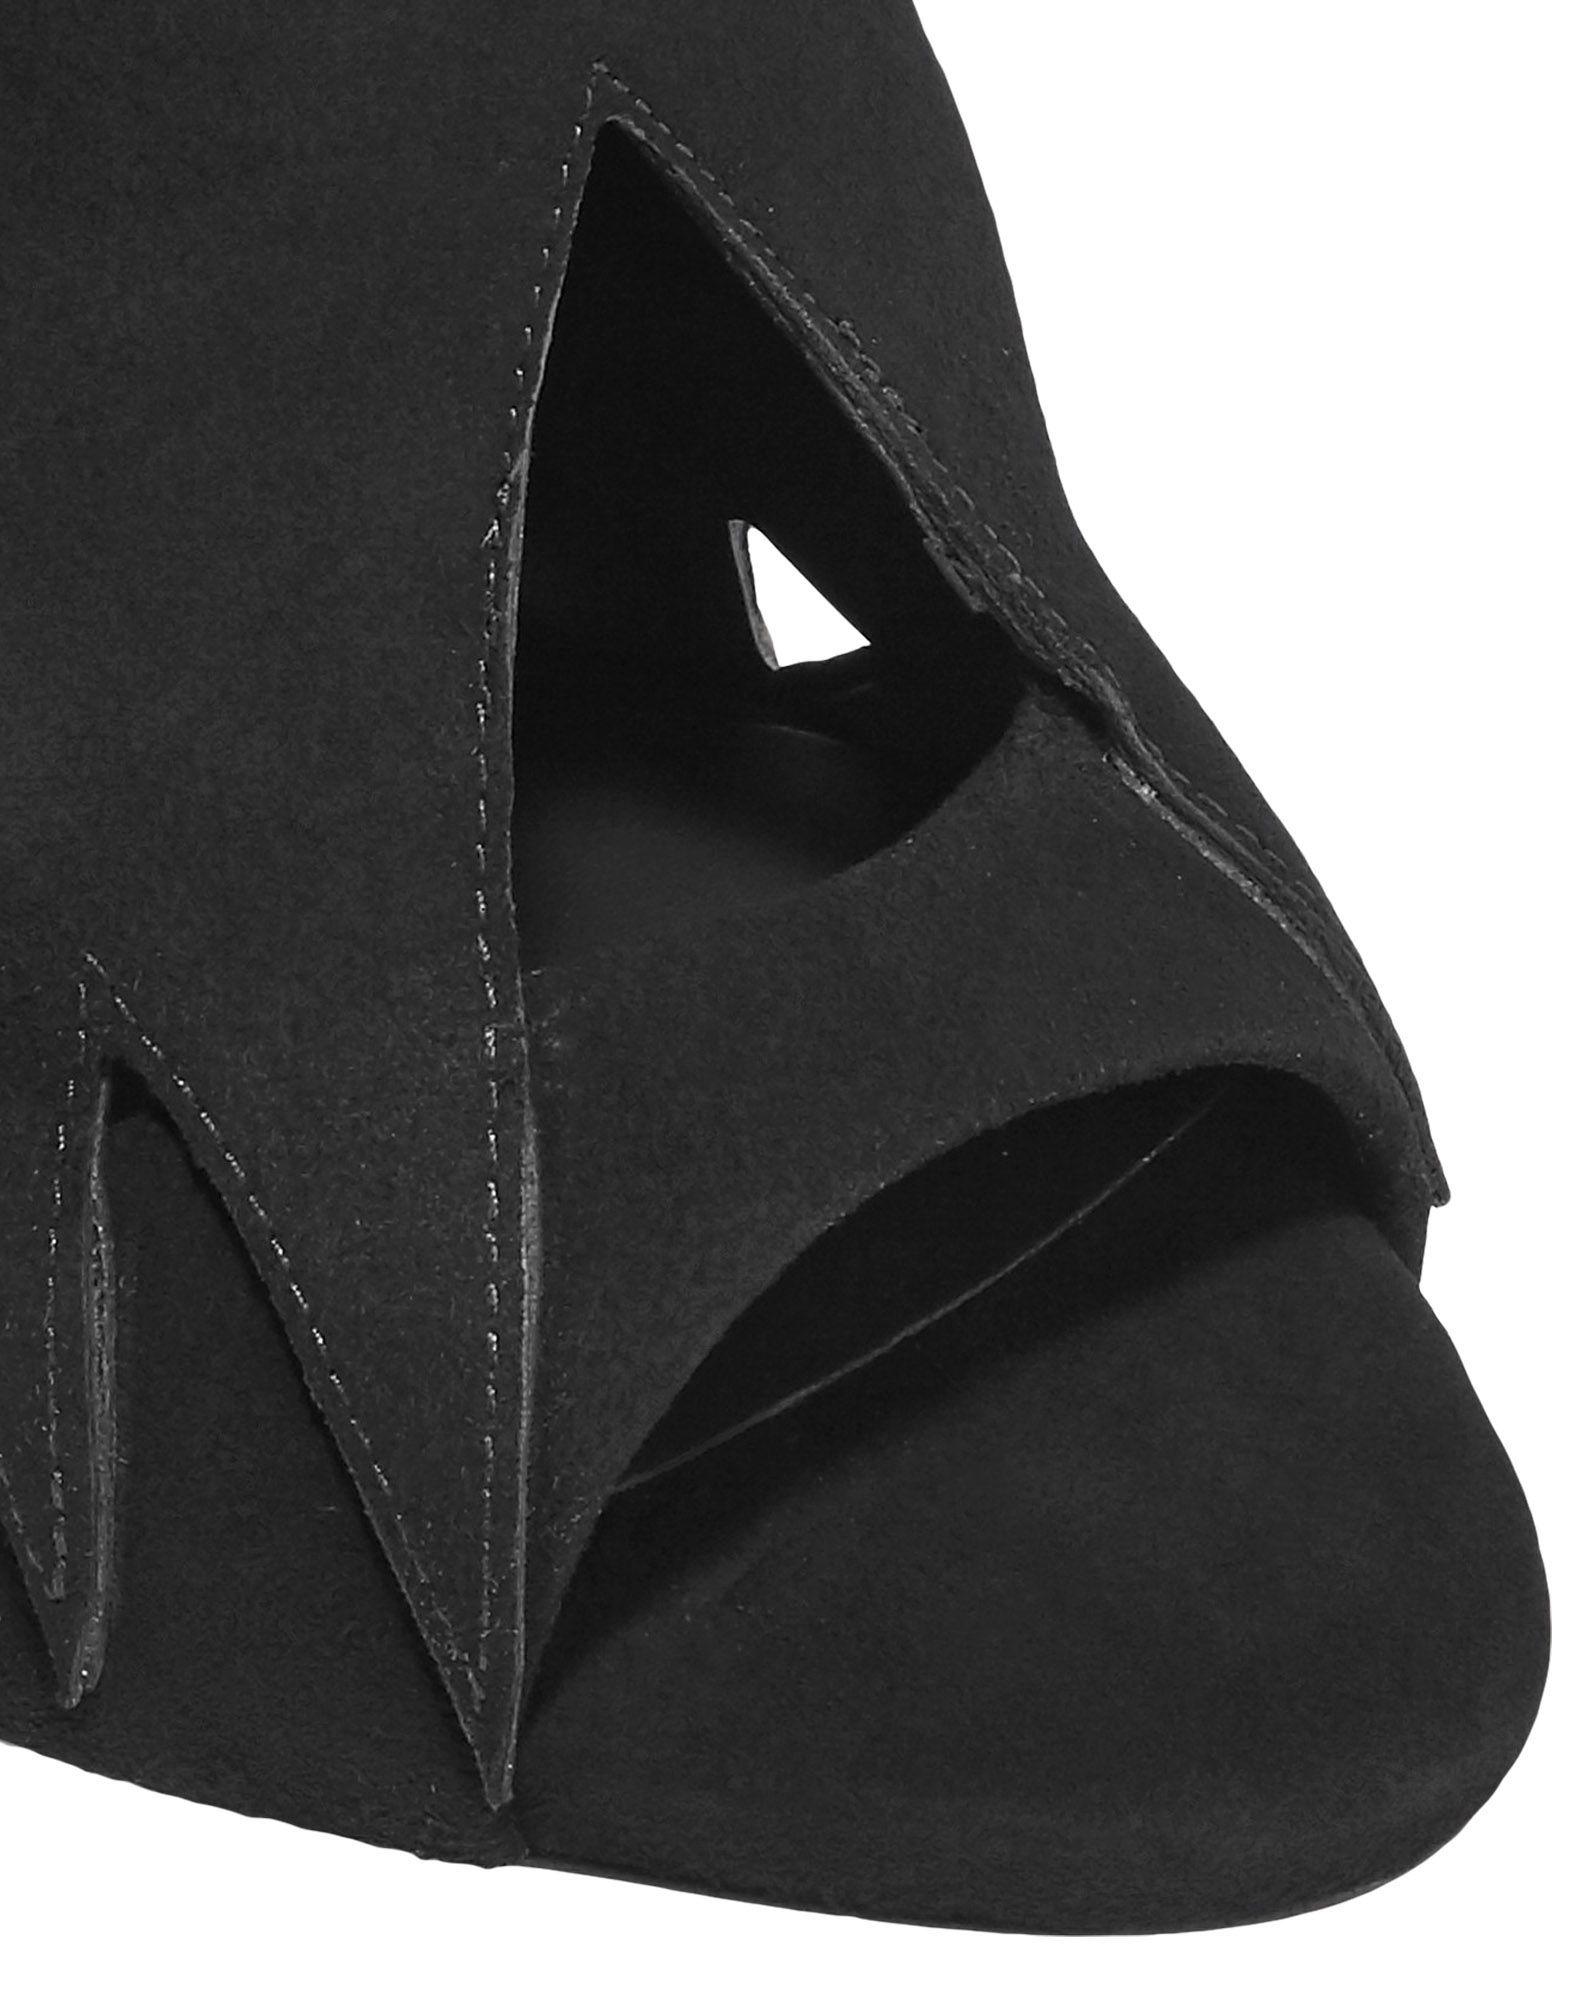 Giuseppe Zanotti Sandalen Damen aussehende  11012064VCGünstige gut aussehende Damen Schuhe 31c0ce